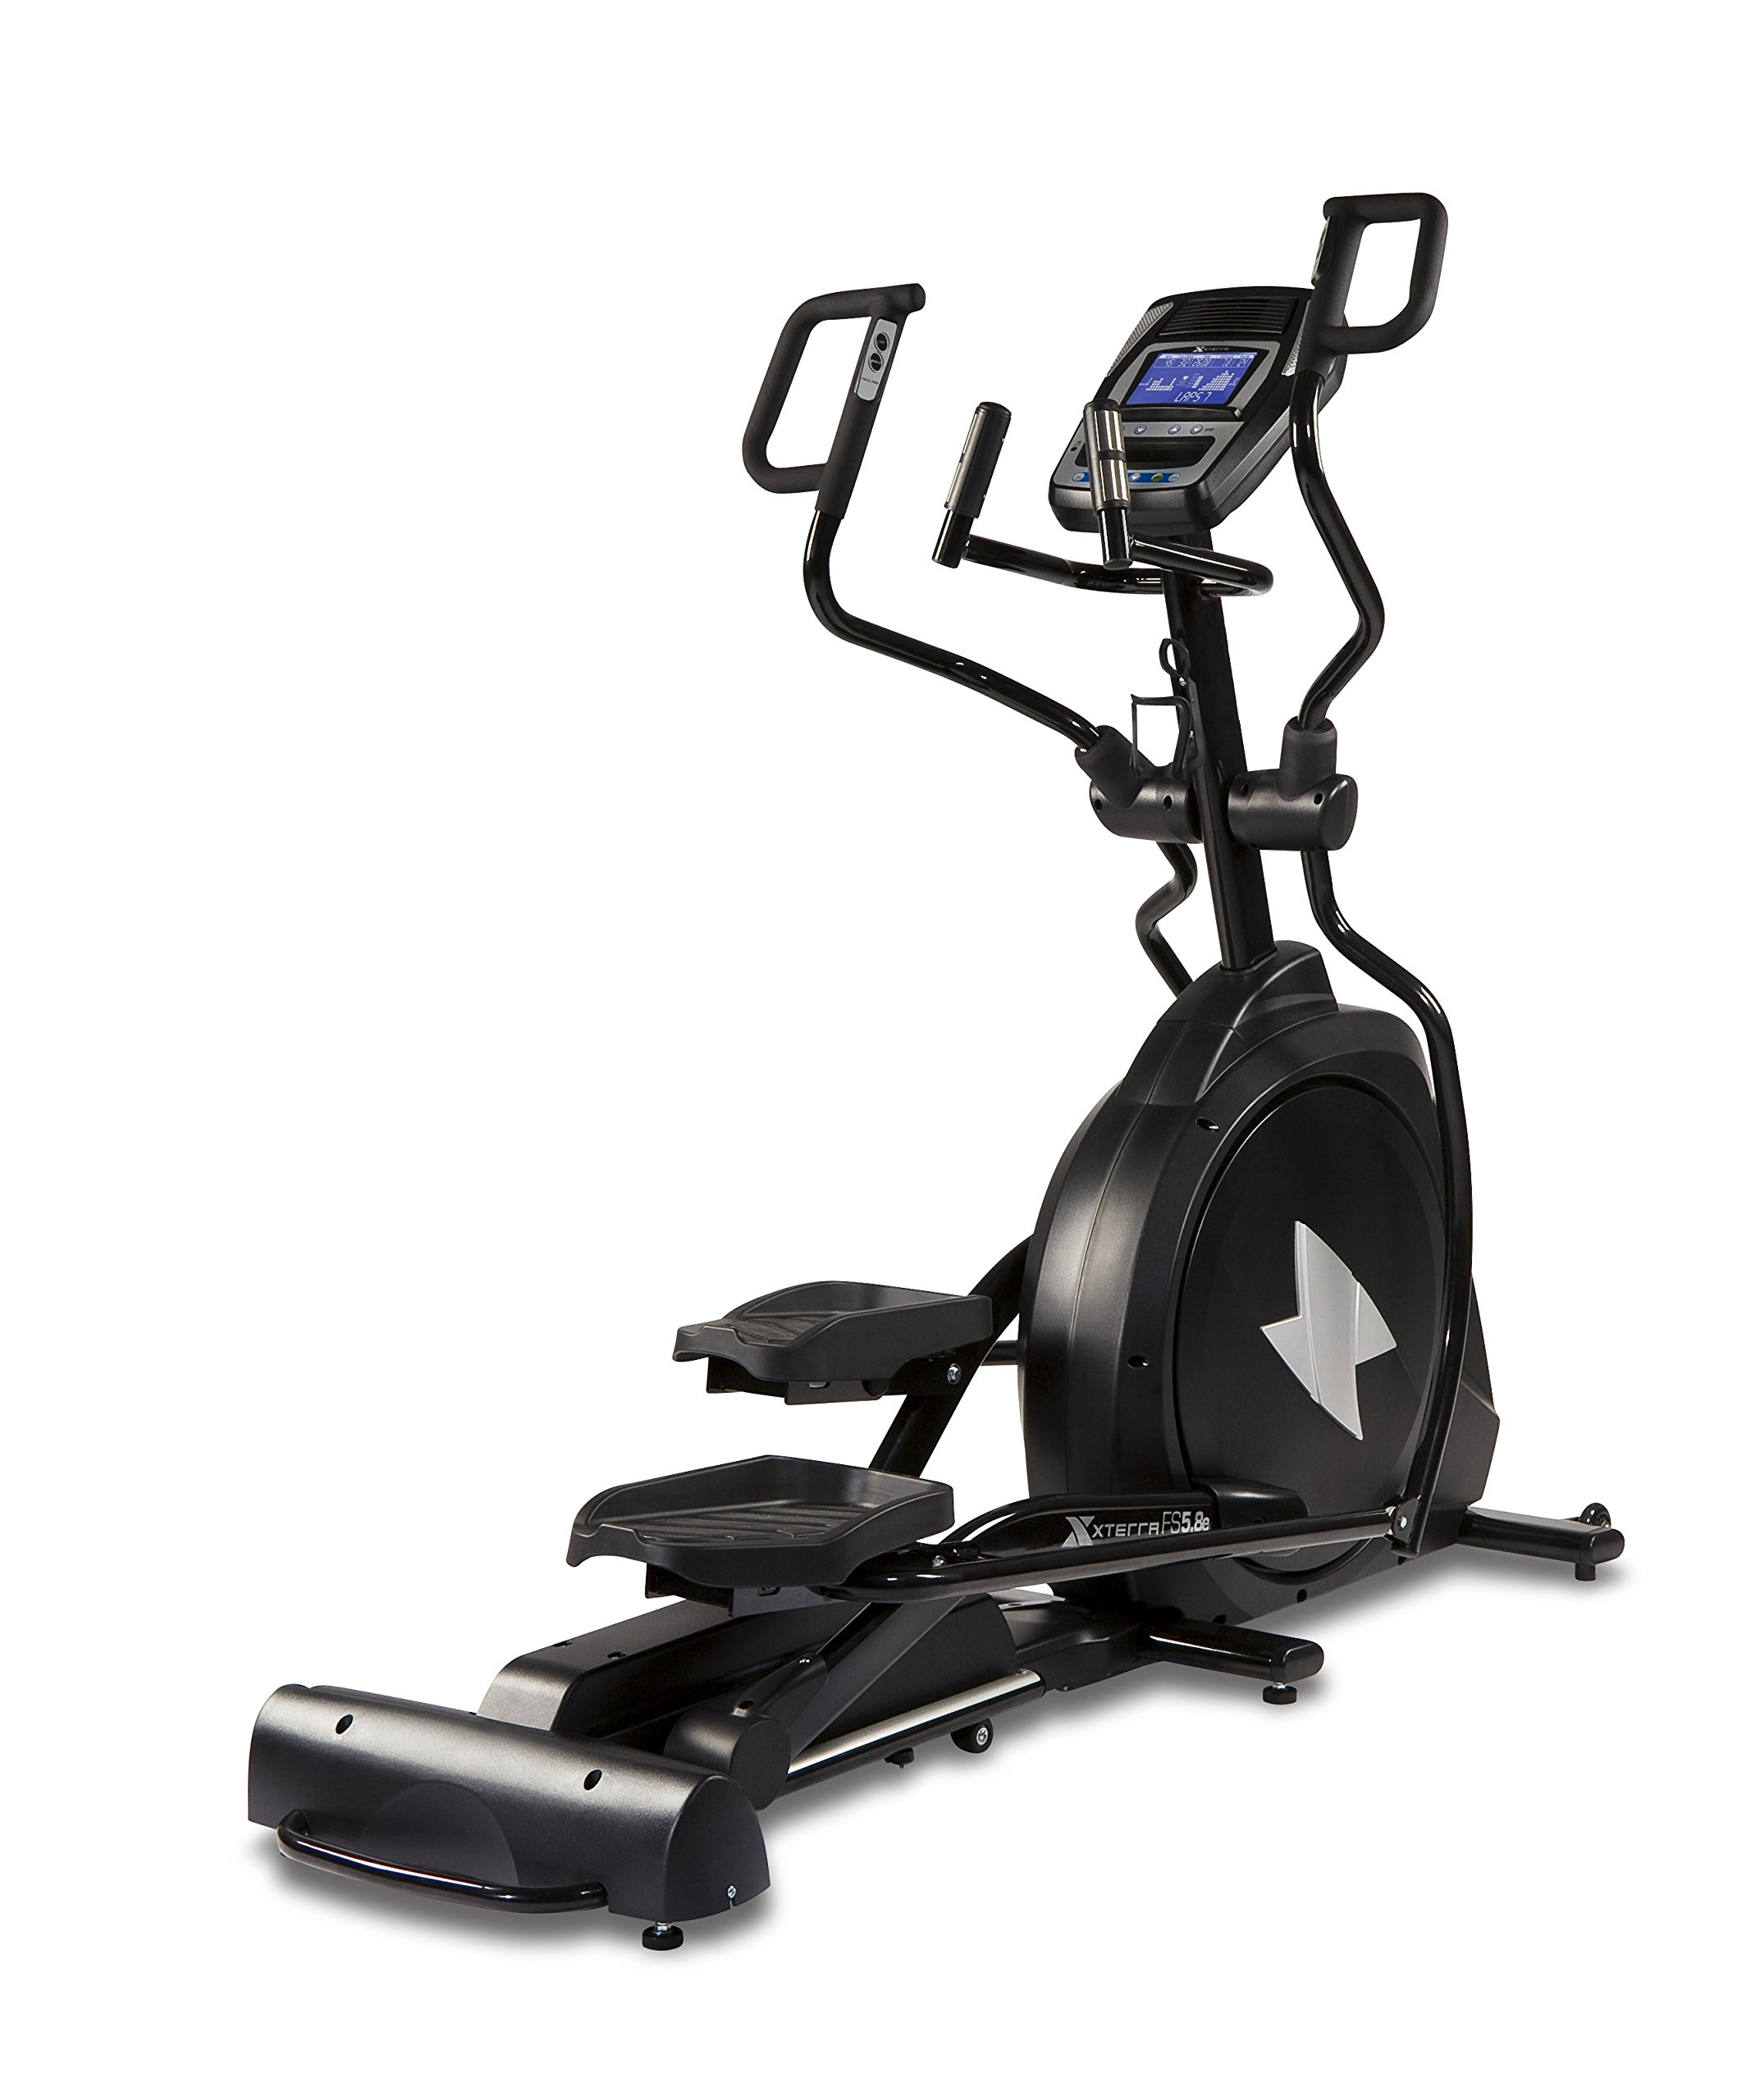 Xterra Fitness FS5.8e Elliptical Trainer, Black